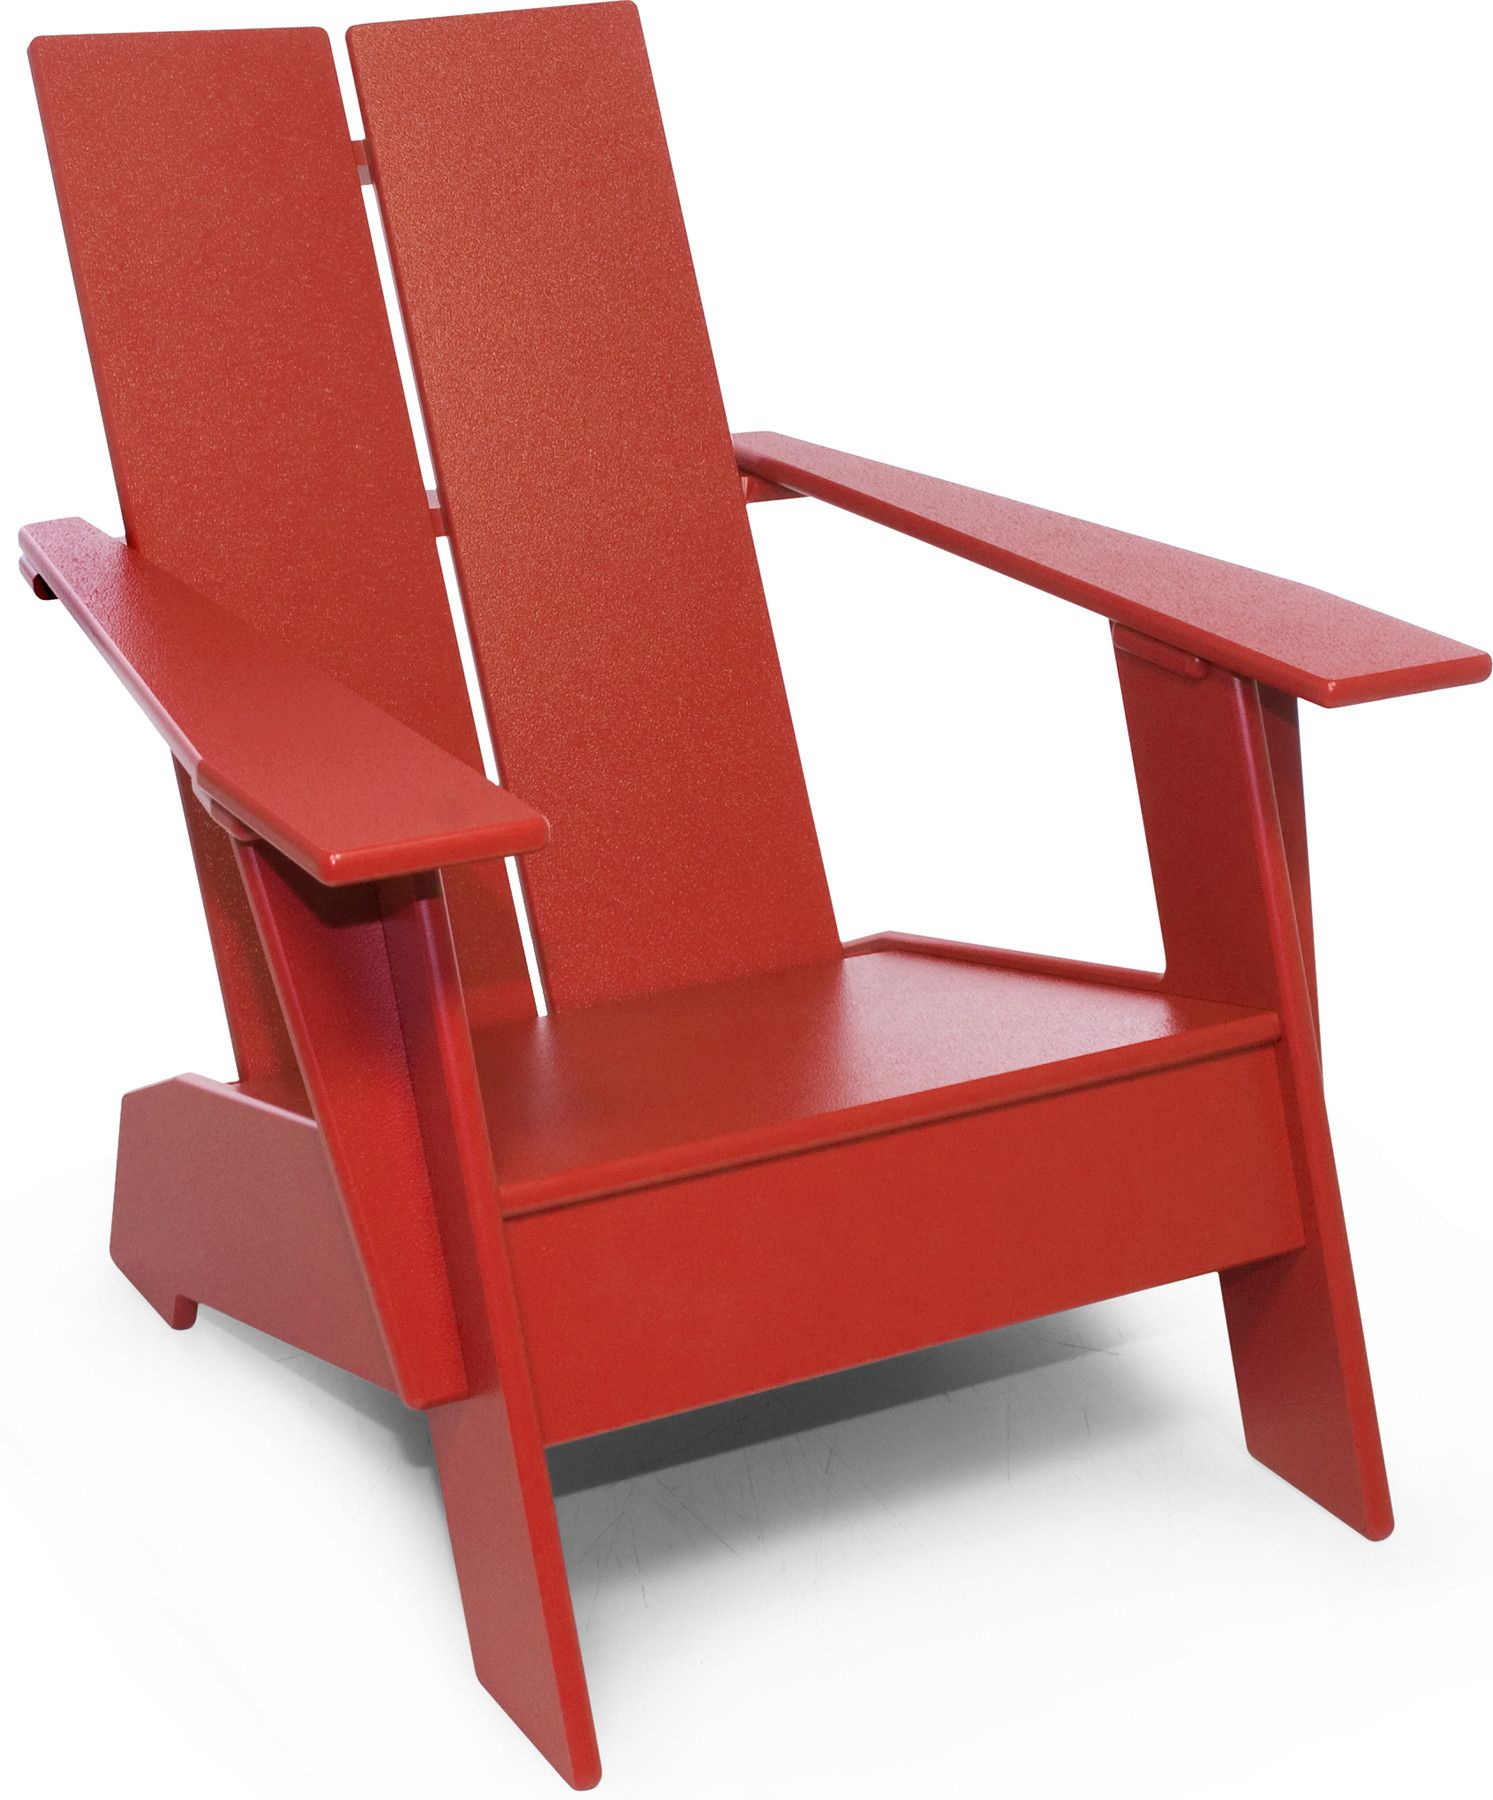 Kids Adirondack Chair | Furniture | Pinterest | Kids ...